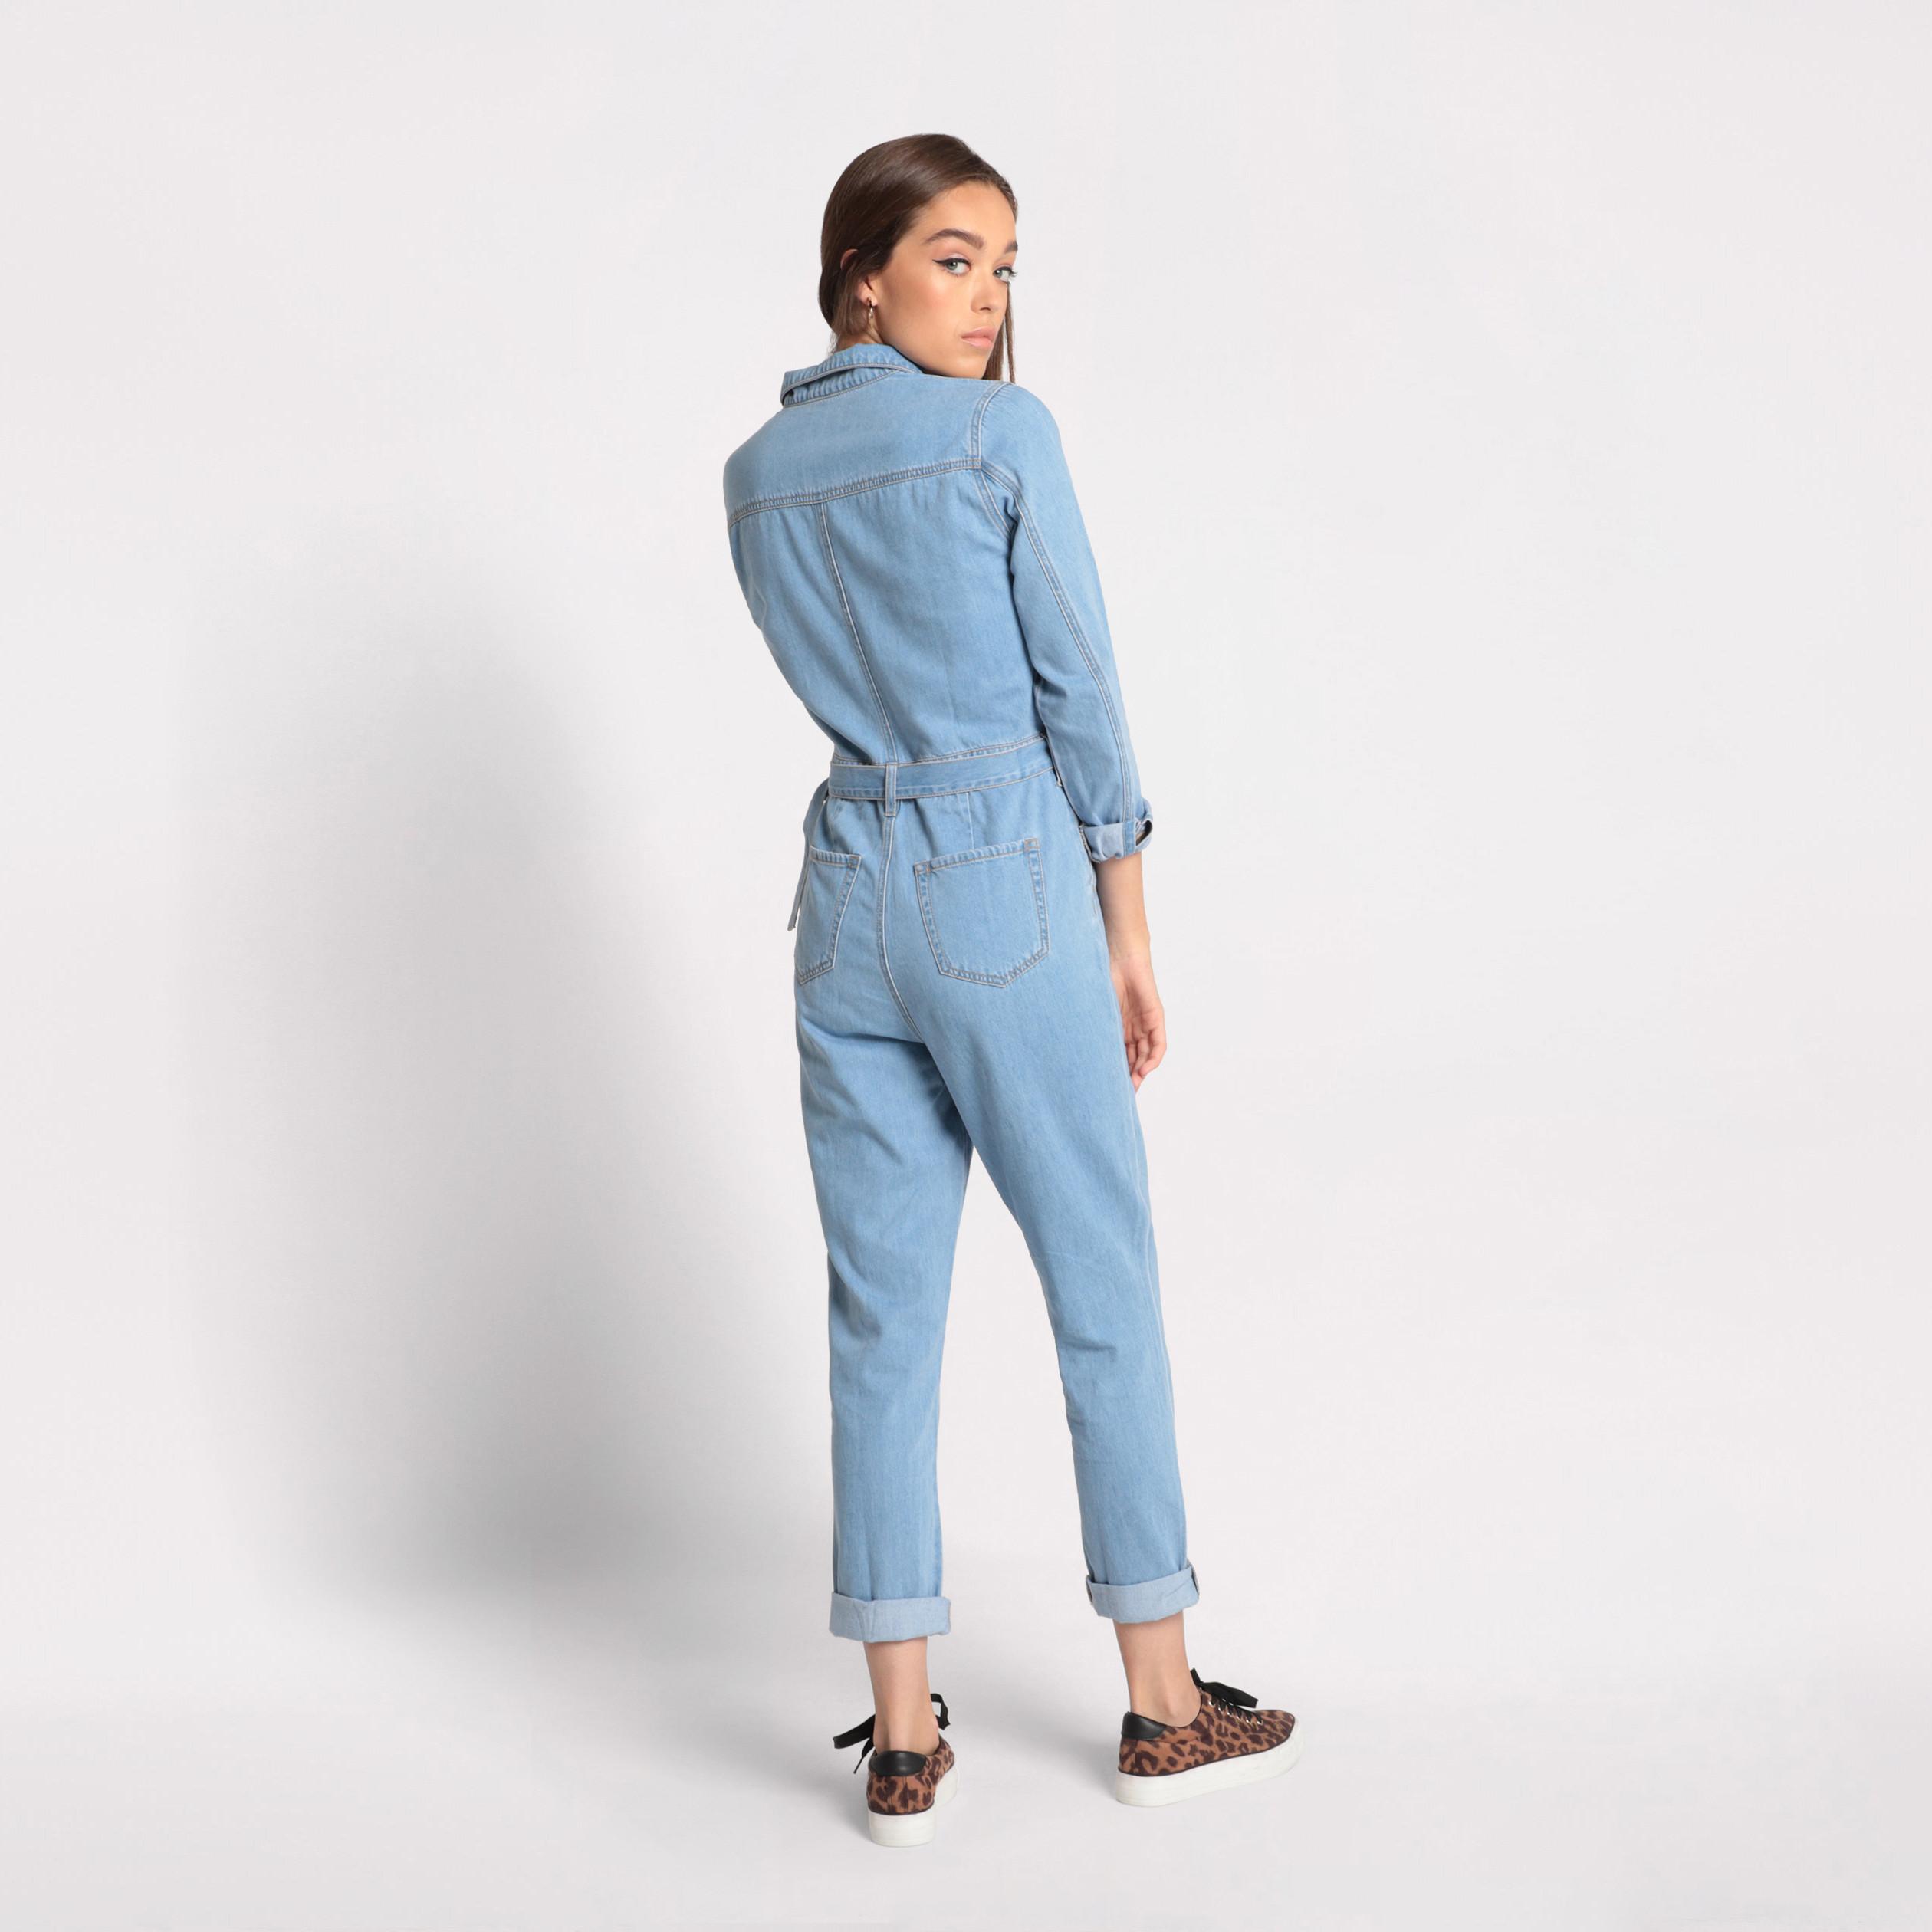 En Stone Denim Combinaison FemmeVib's Jean Pantalon Double kO8n0wP